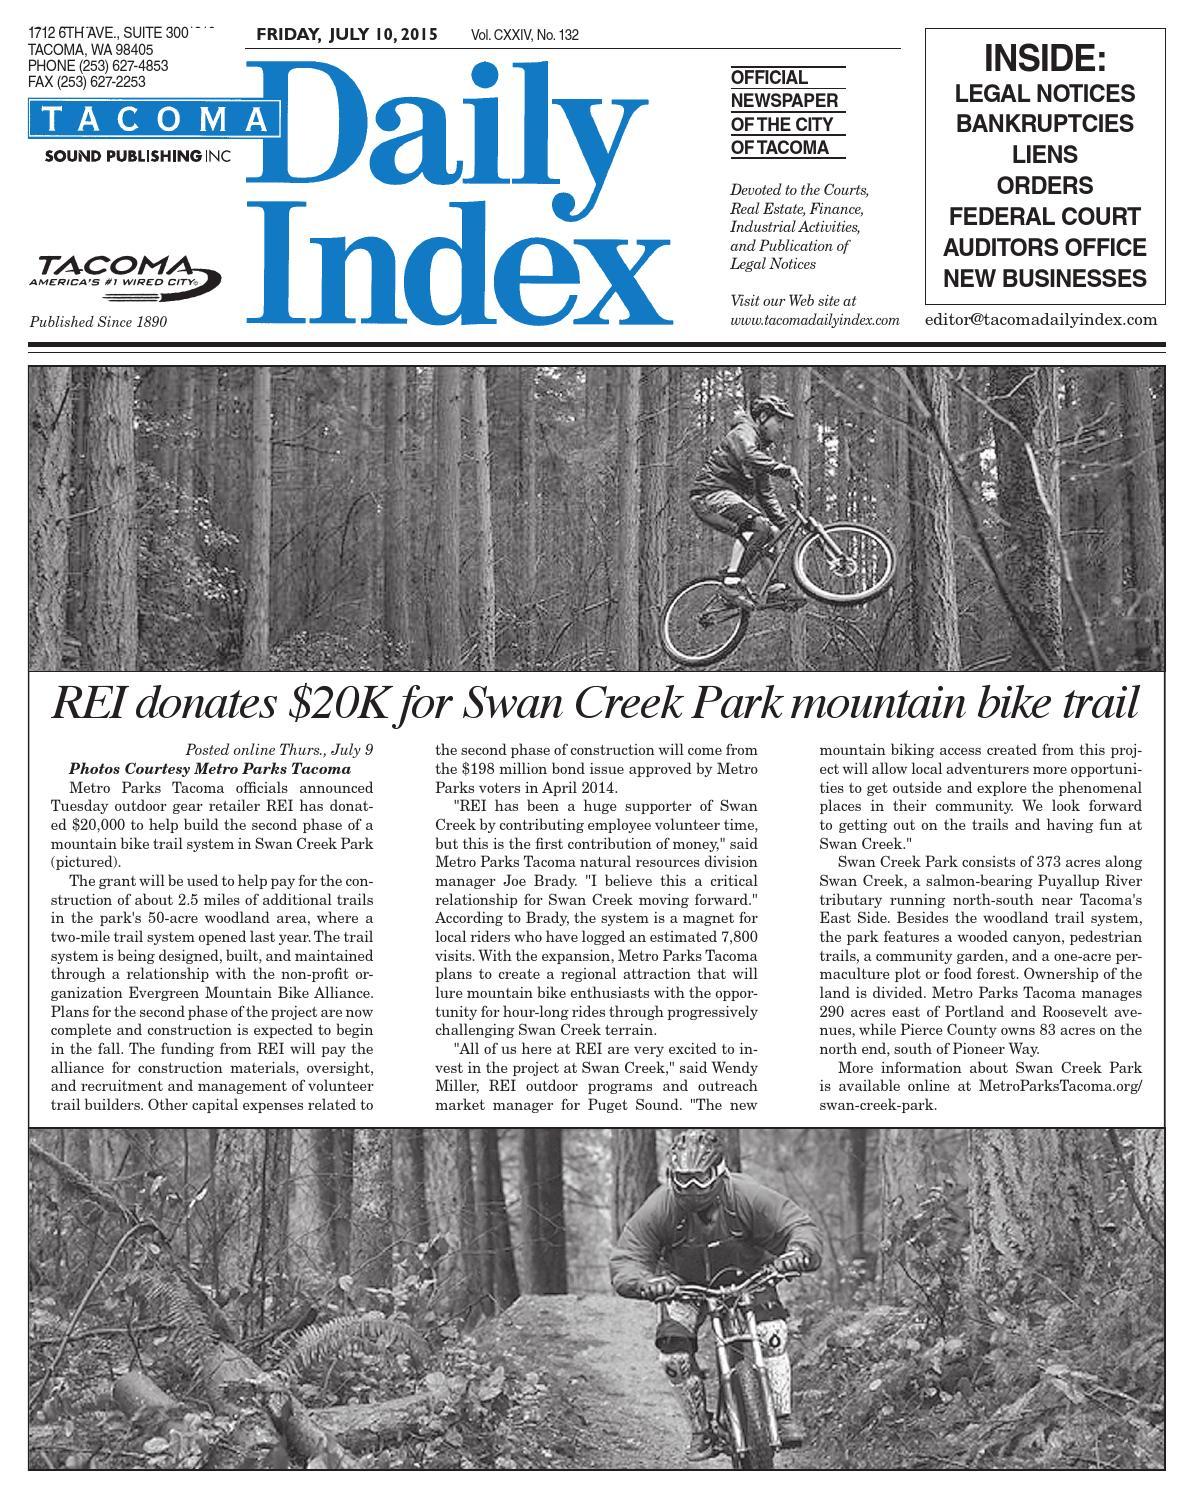 Tacoma Daily Index July 10 2015 By Sound Publishing Issuu